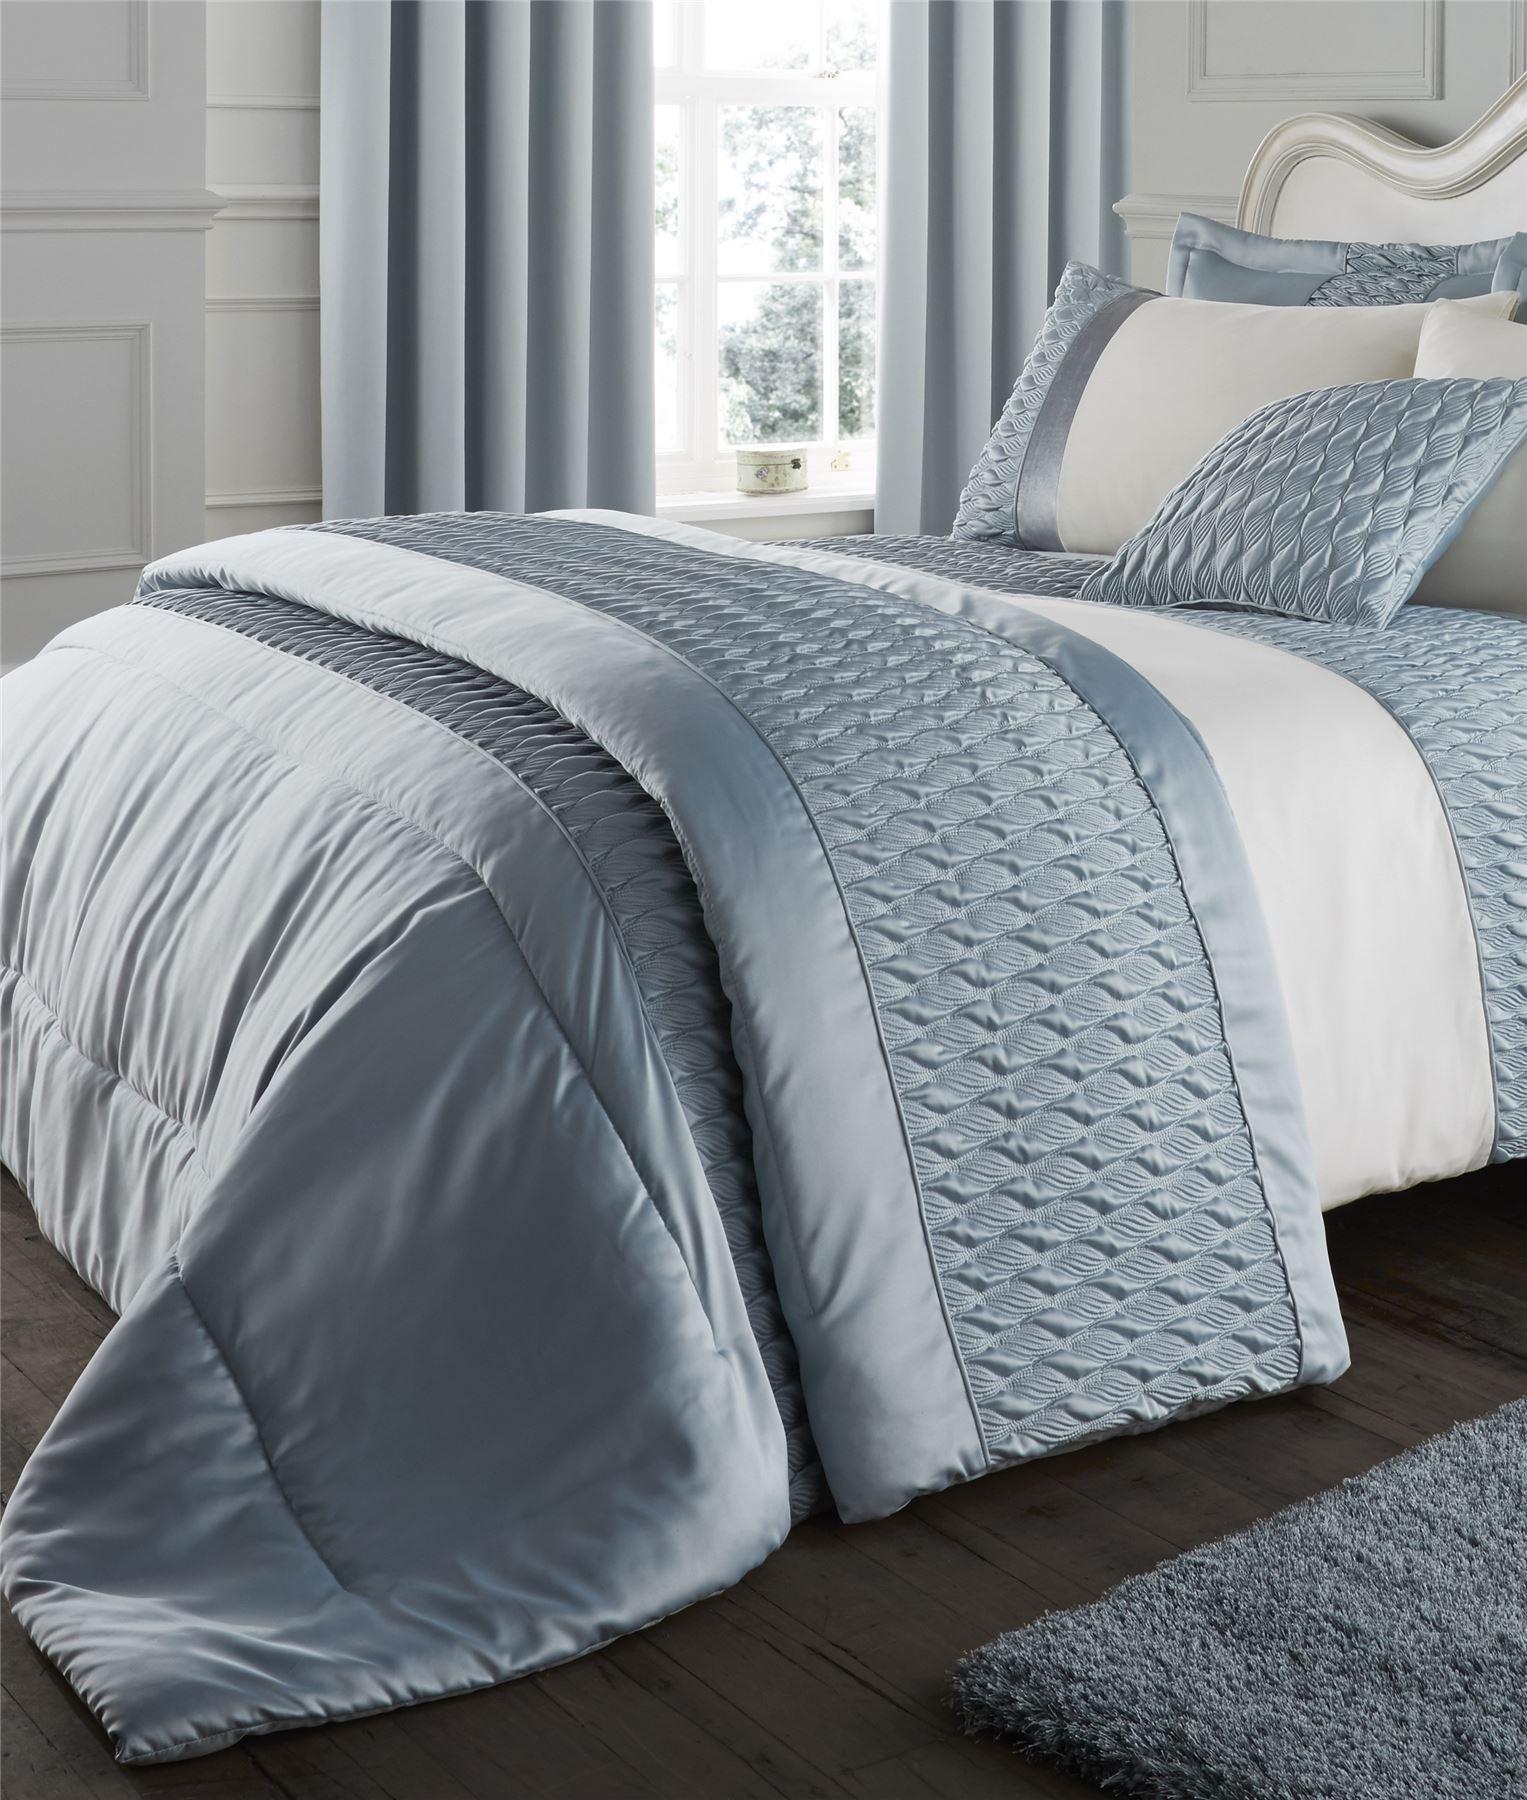 Duck Egg Catherine Lansfield Bedding Bed Set Curtains Duvet Quilt Or Bedspread Ebay